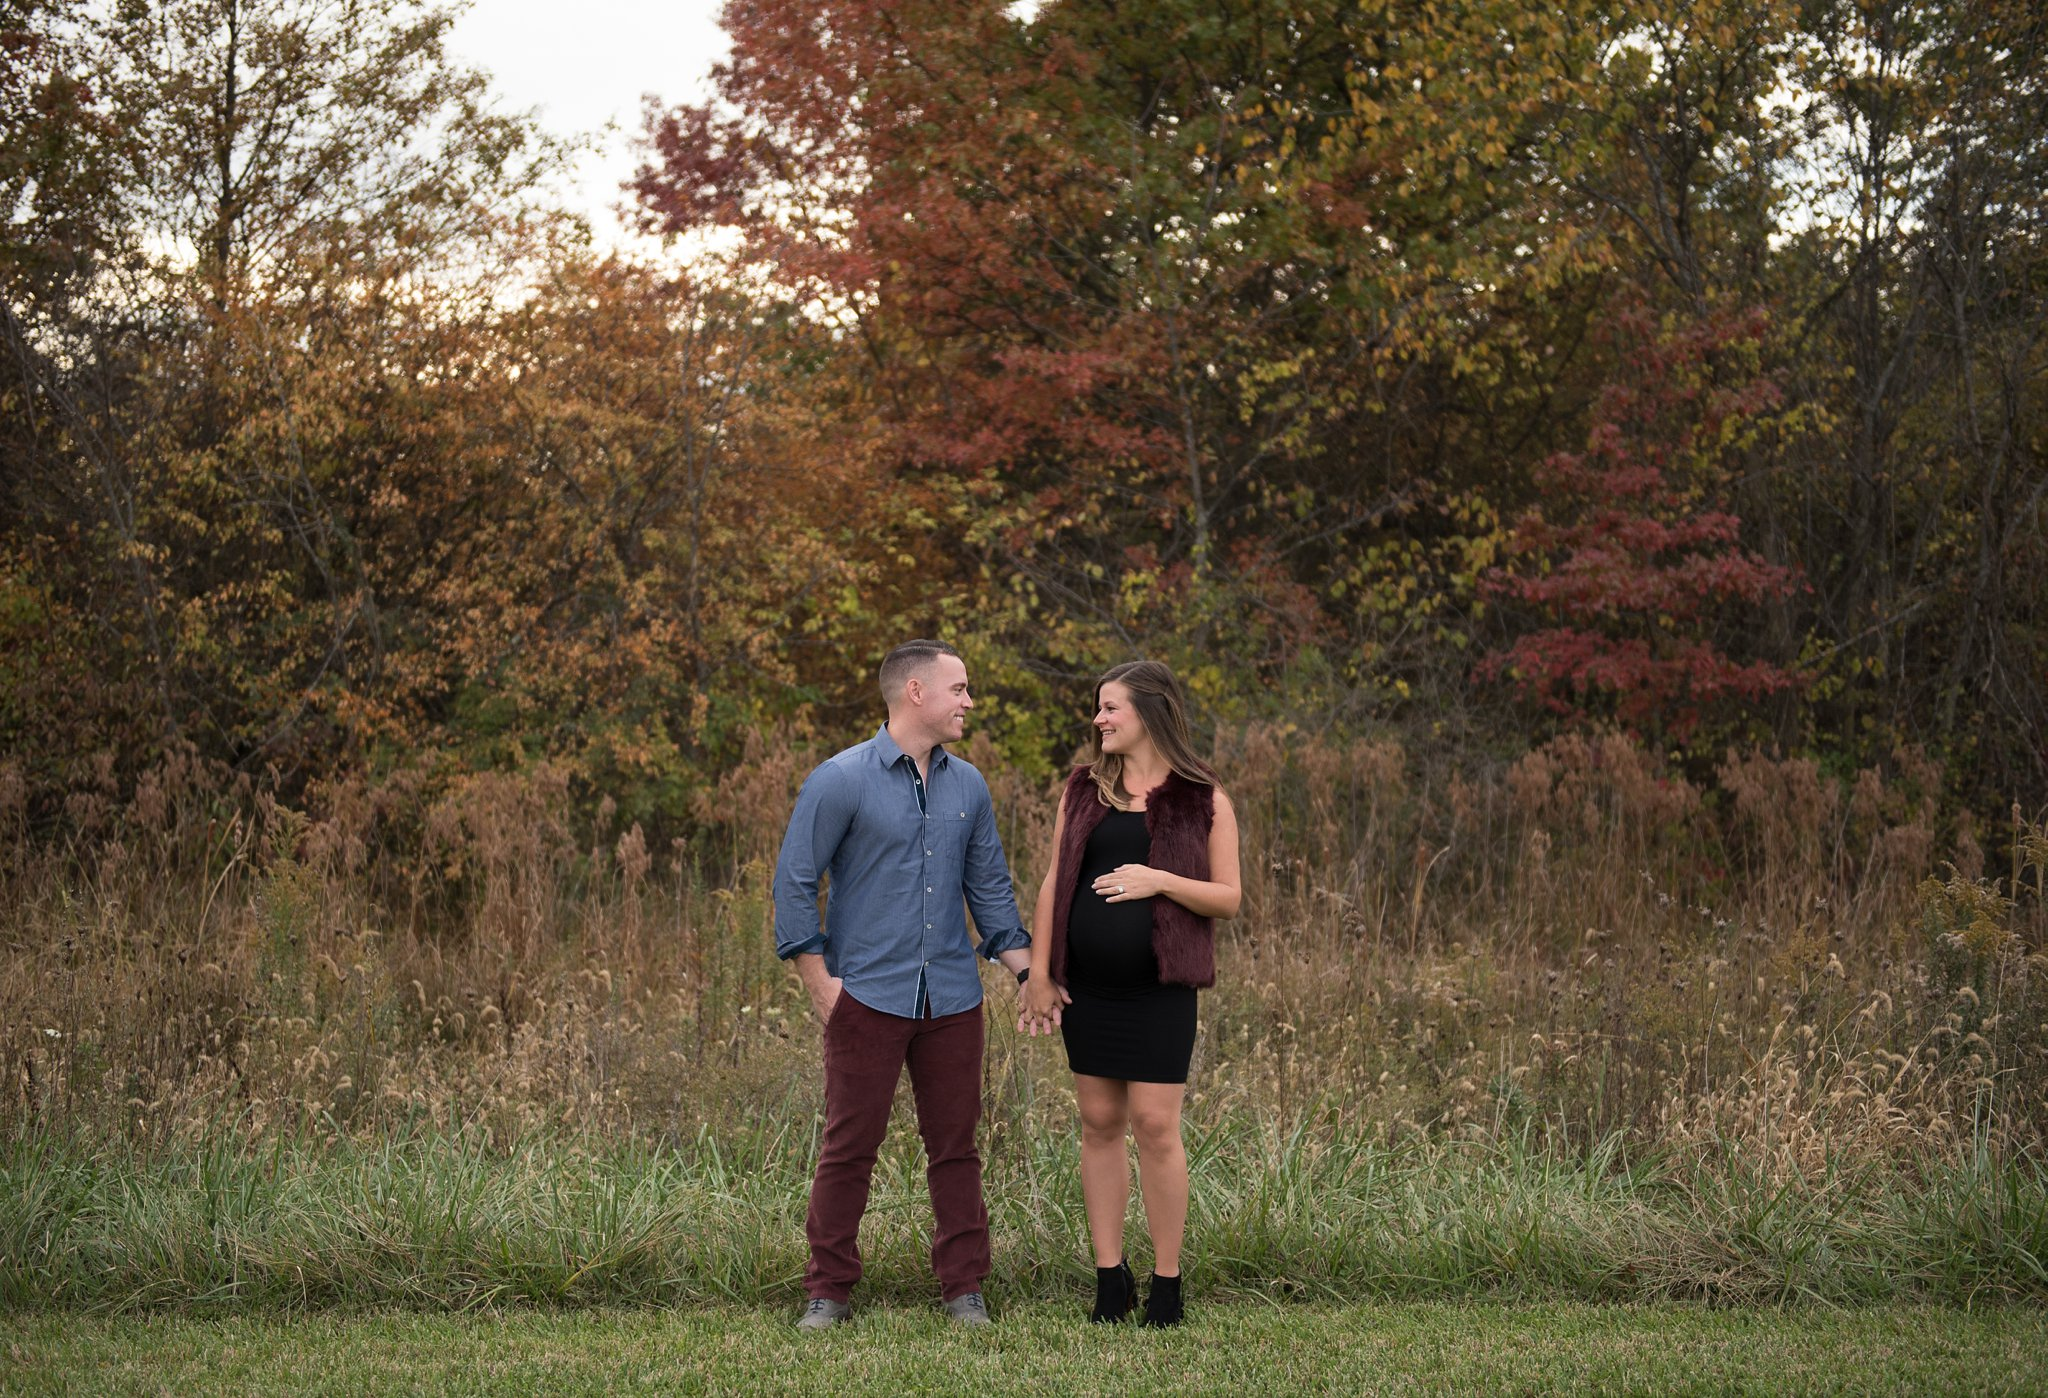 maternityphotographer-columbusohio-pregnancyphotography-jacquelinemariephotography-2.jpg